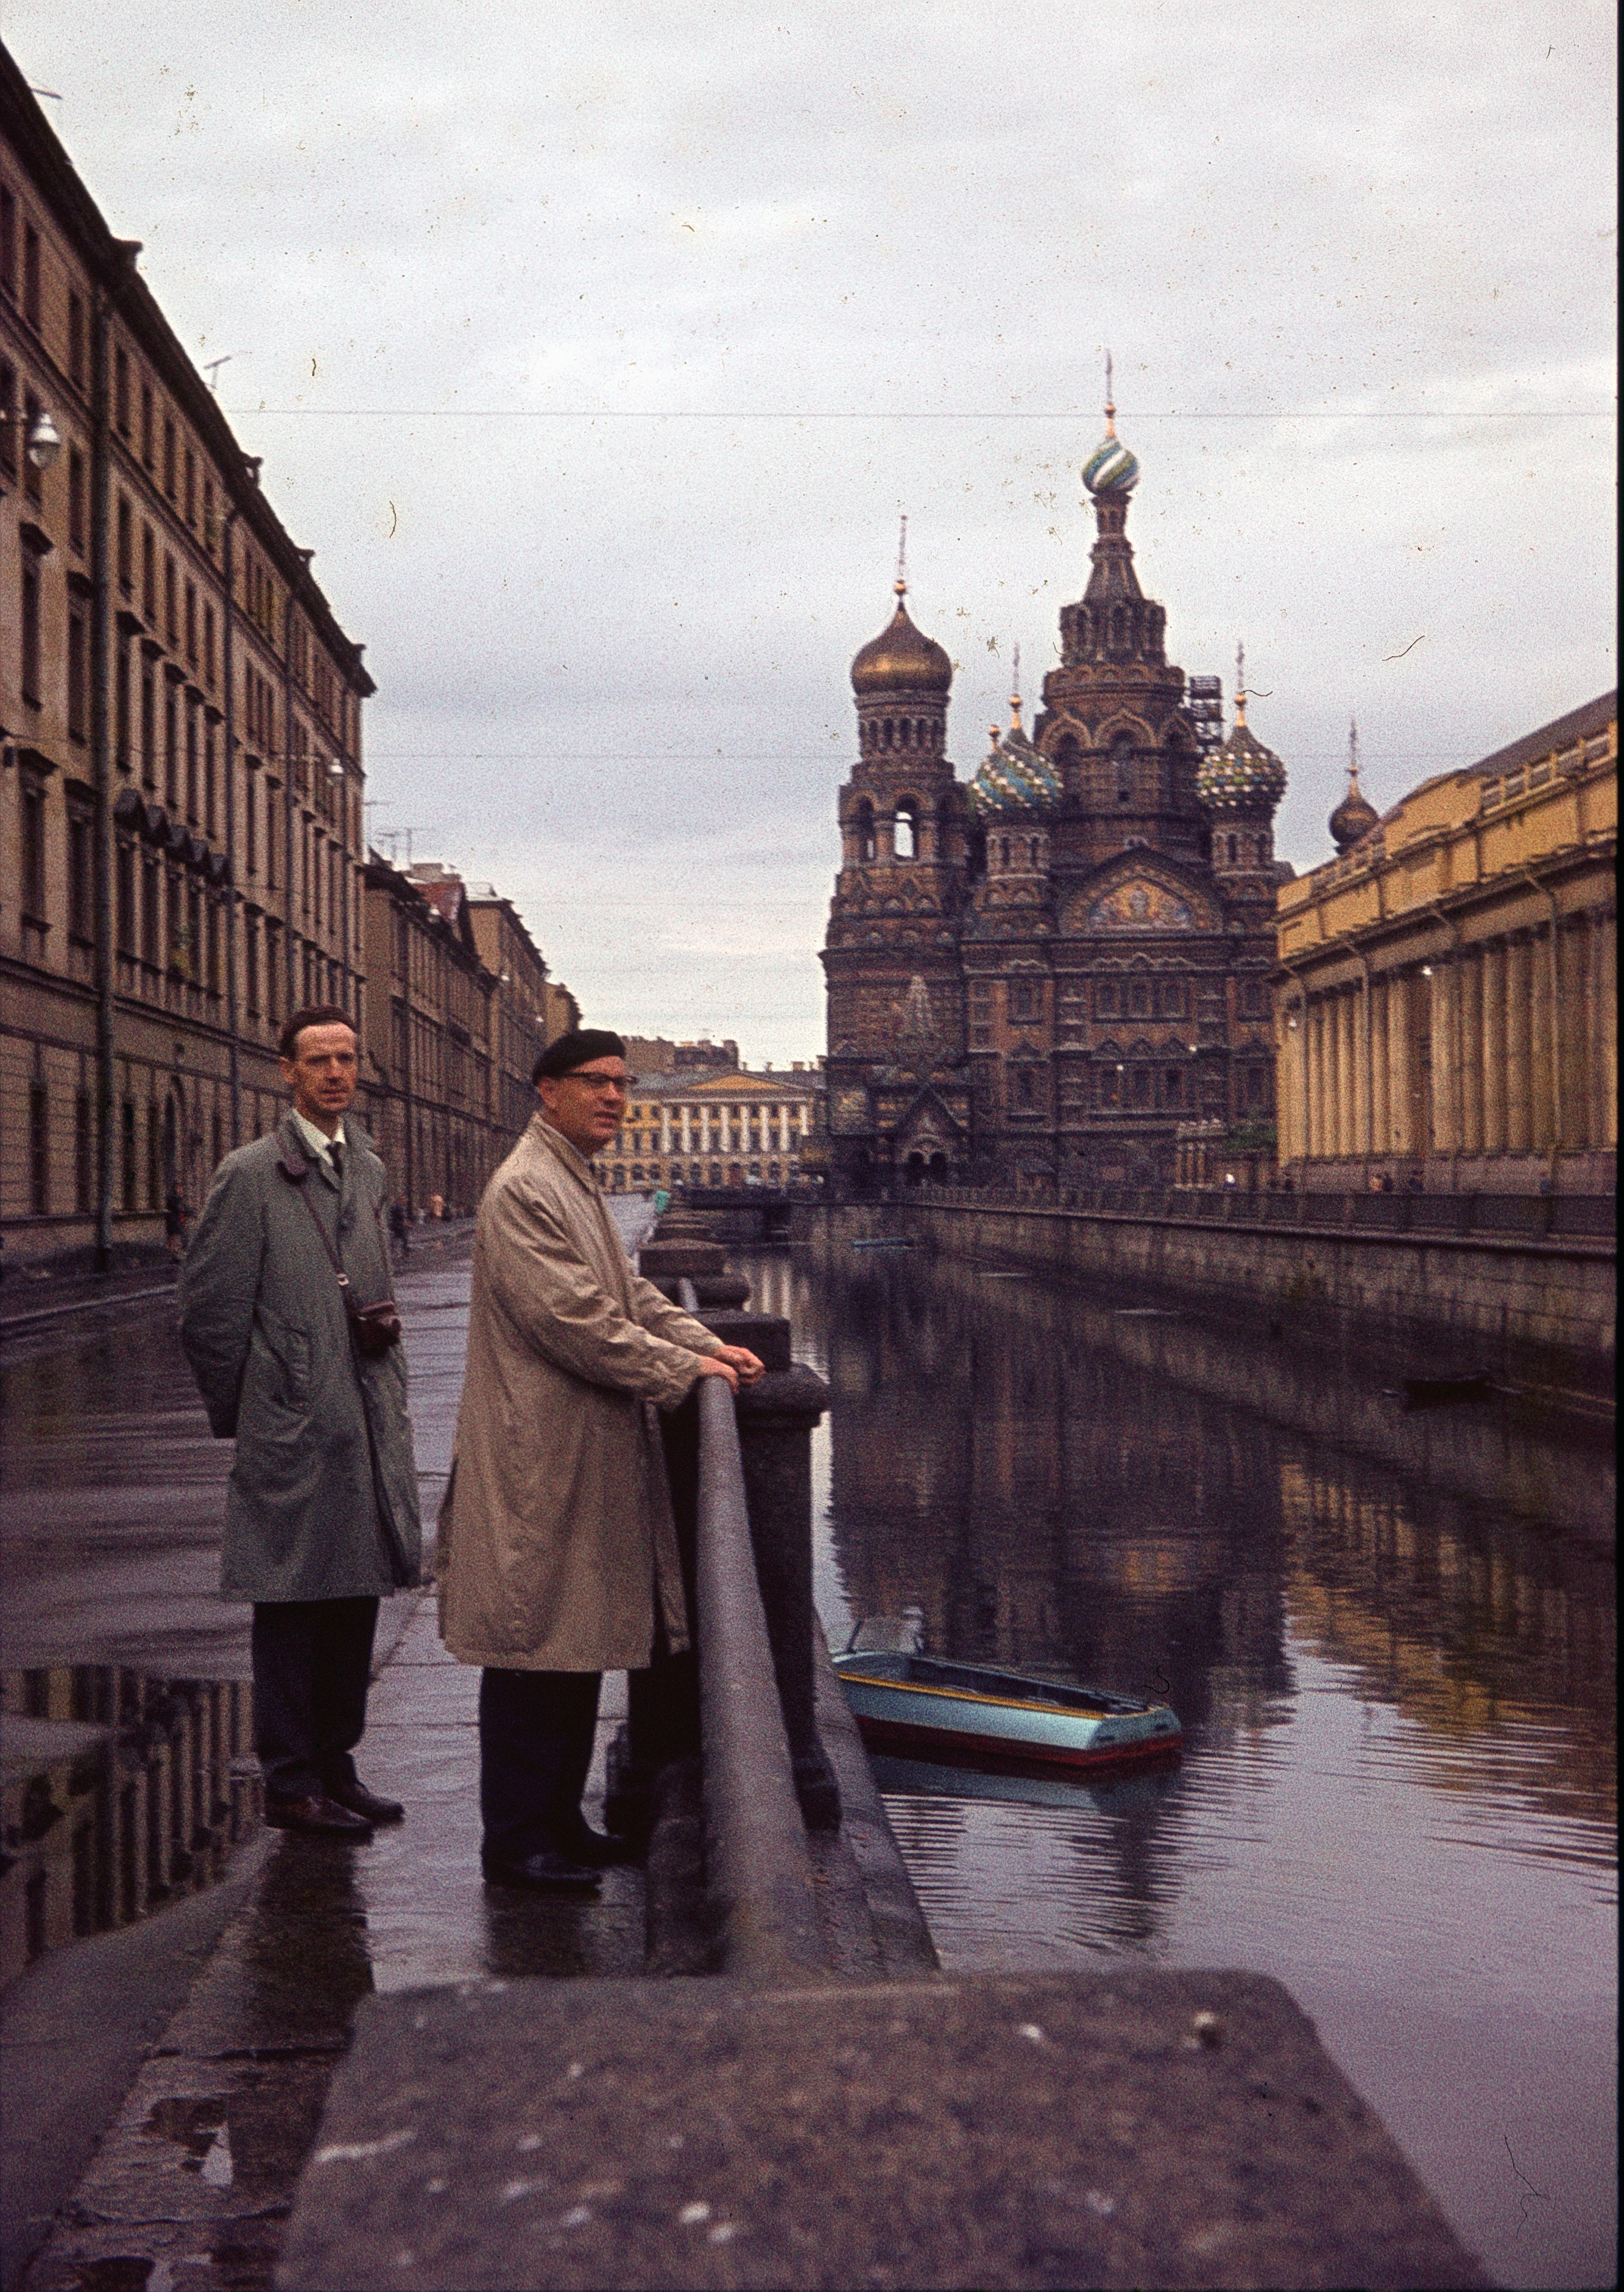 Ленинград. Канал Грибоедова